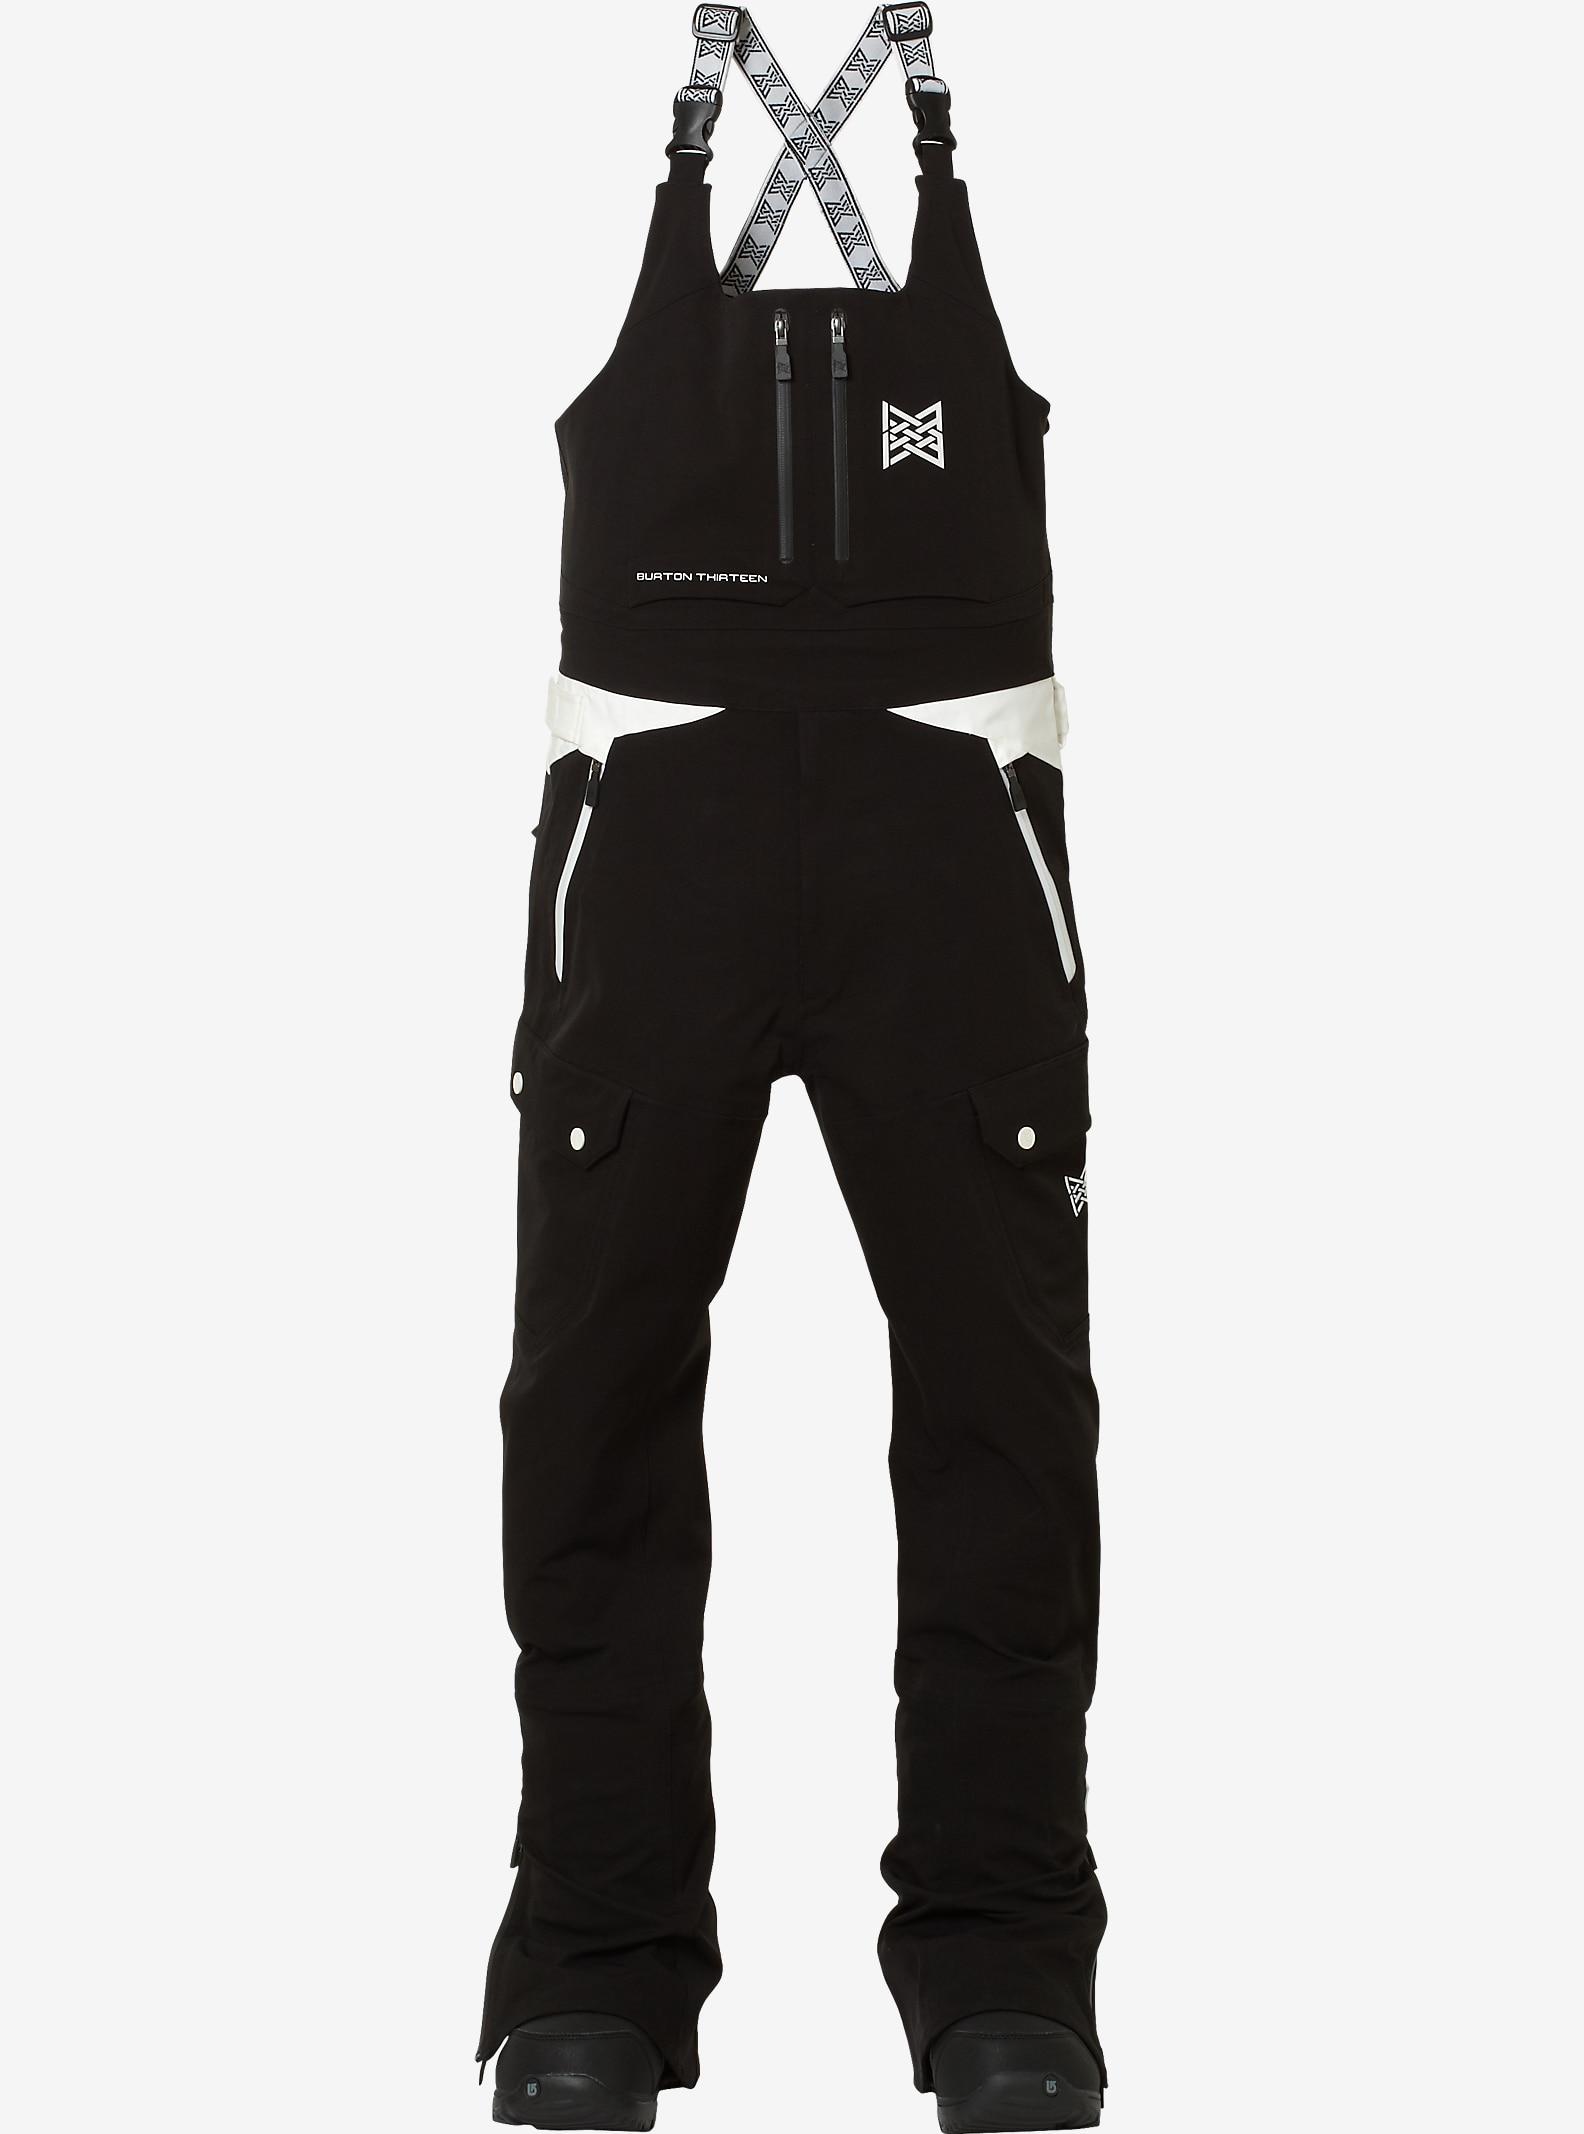 Burton THIRTEEN Moqui Bib Pant shown in Black